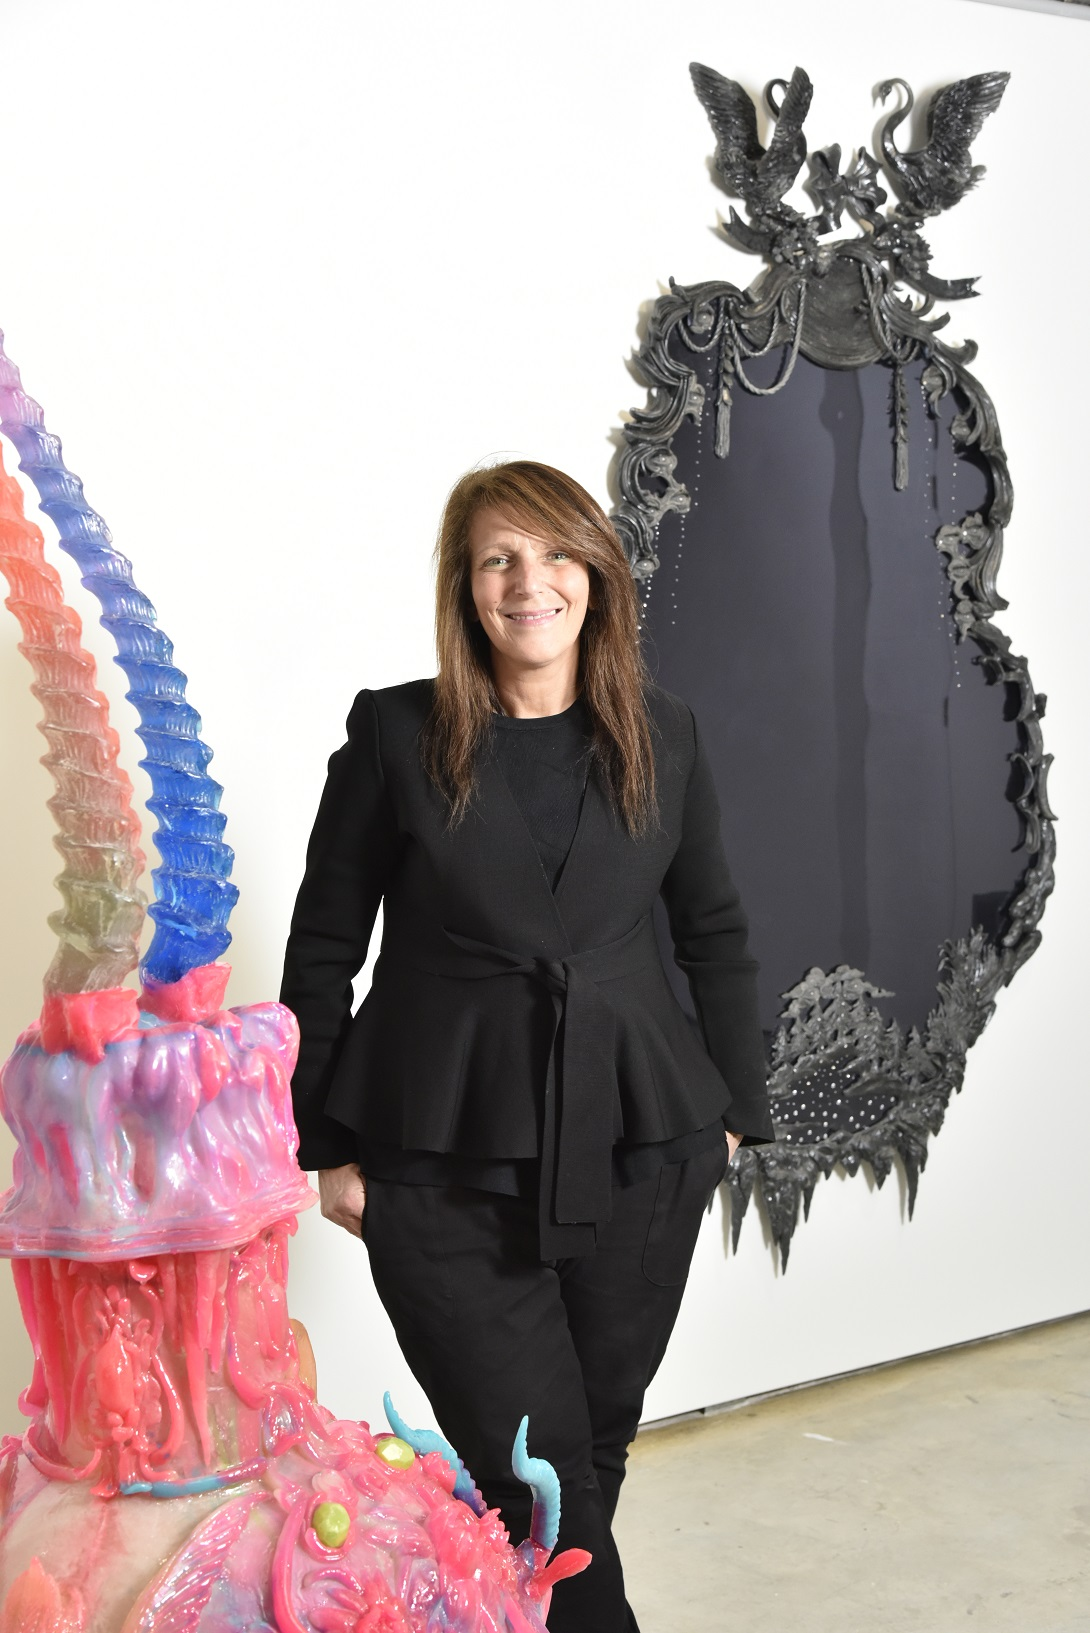 Lisa Fehily, Director Finkelstein Gallery. Image credit Natalia Sikiric